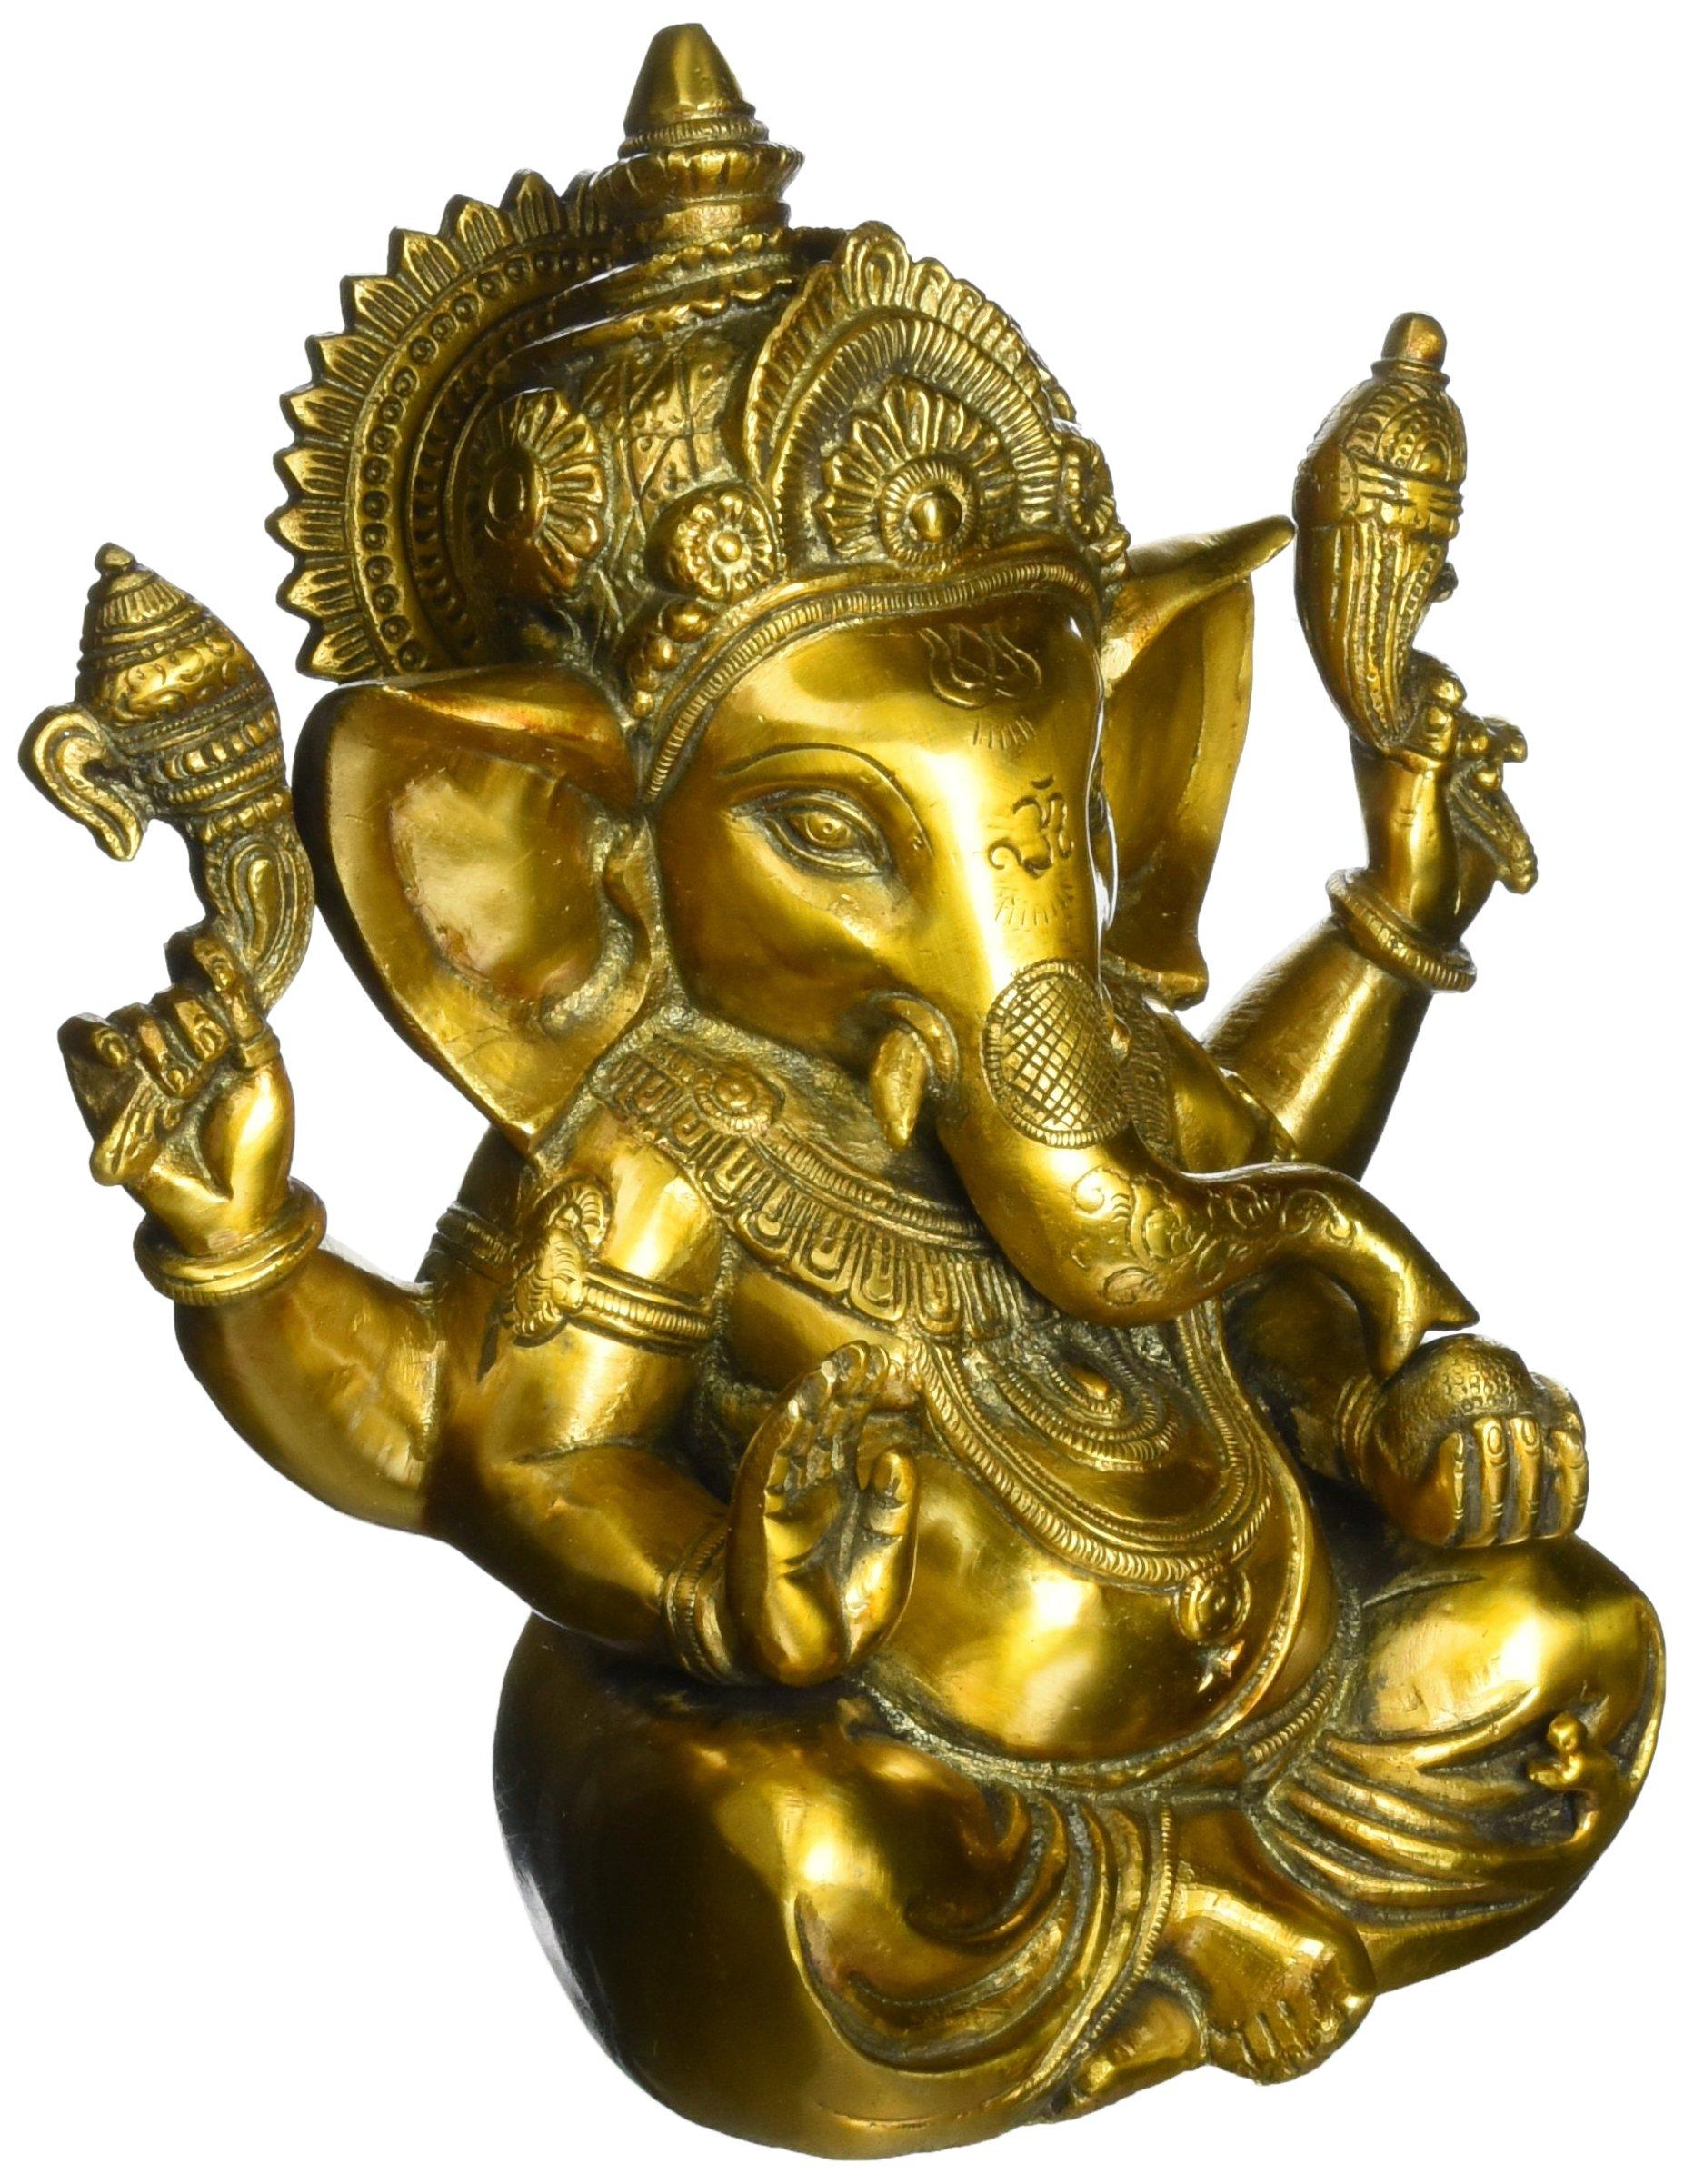 Aone India Large Ganesh Idol Figurine Elephant God Statue Showpiece Antique Finish Sculpture - Brass Ganesha + Cash Envelope (Pack Of 10)